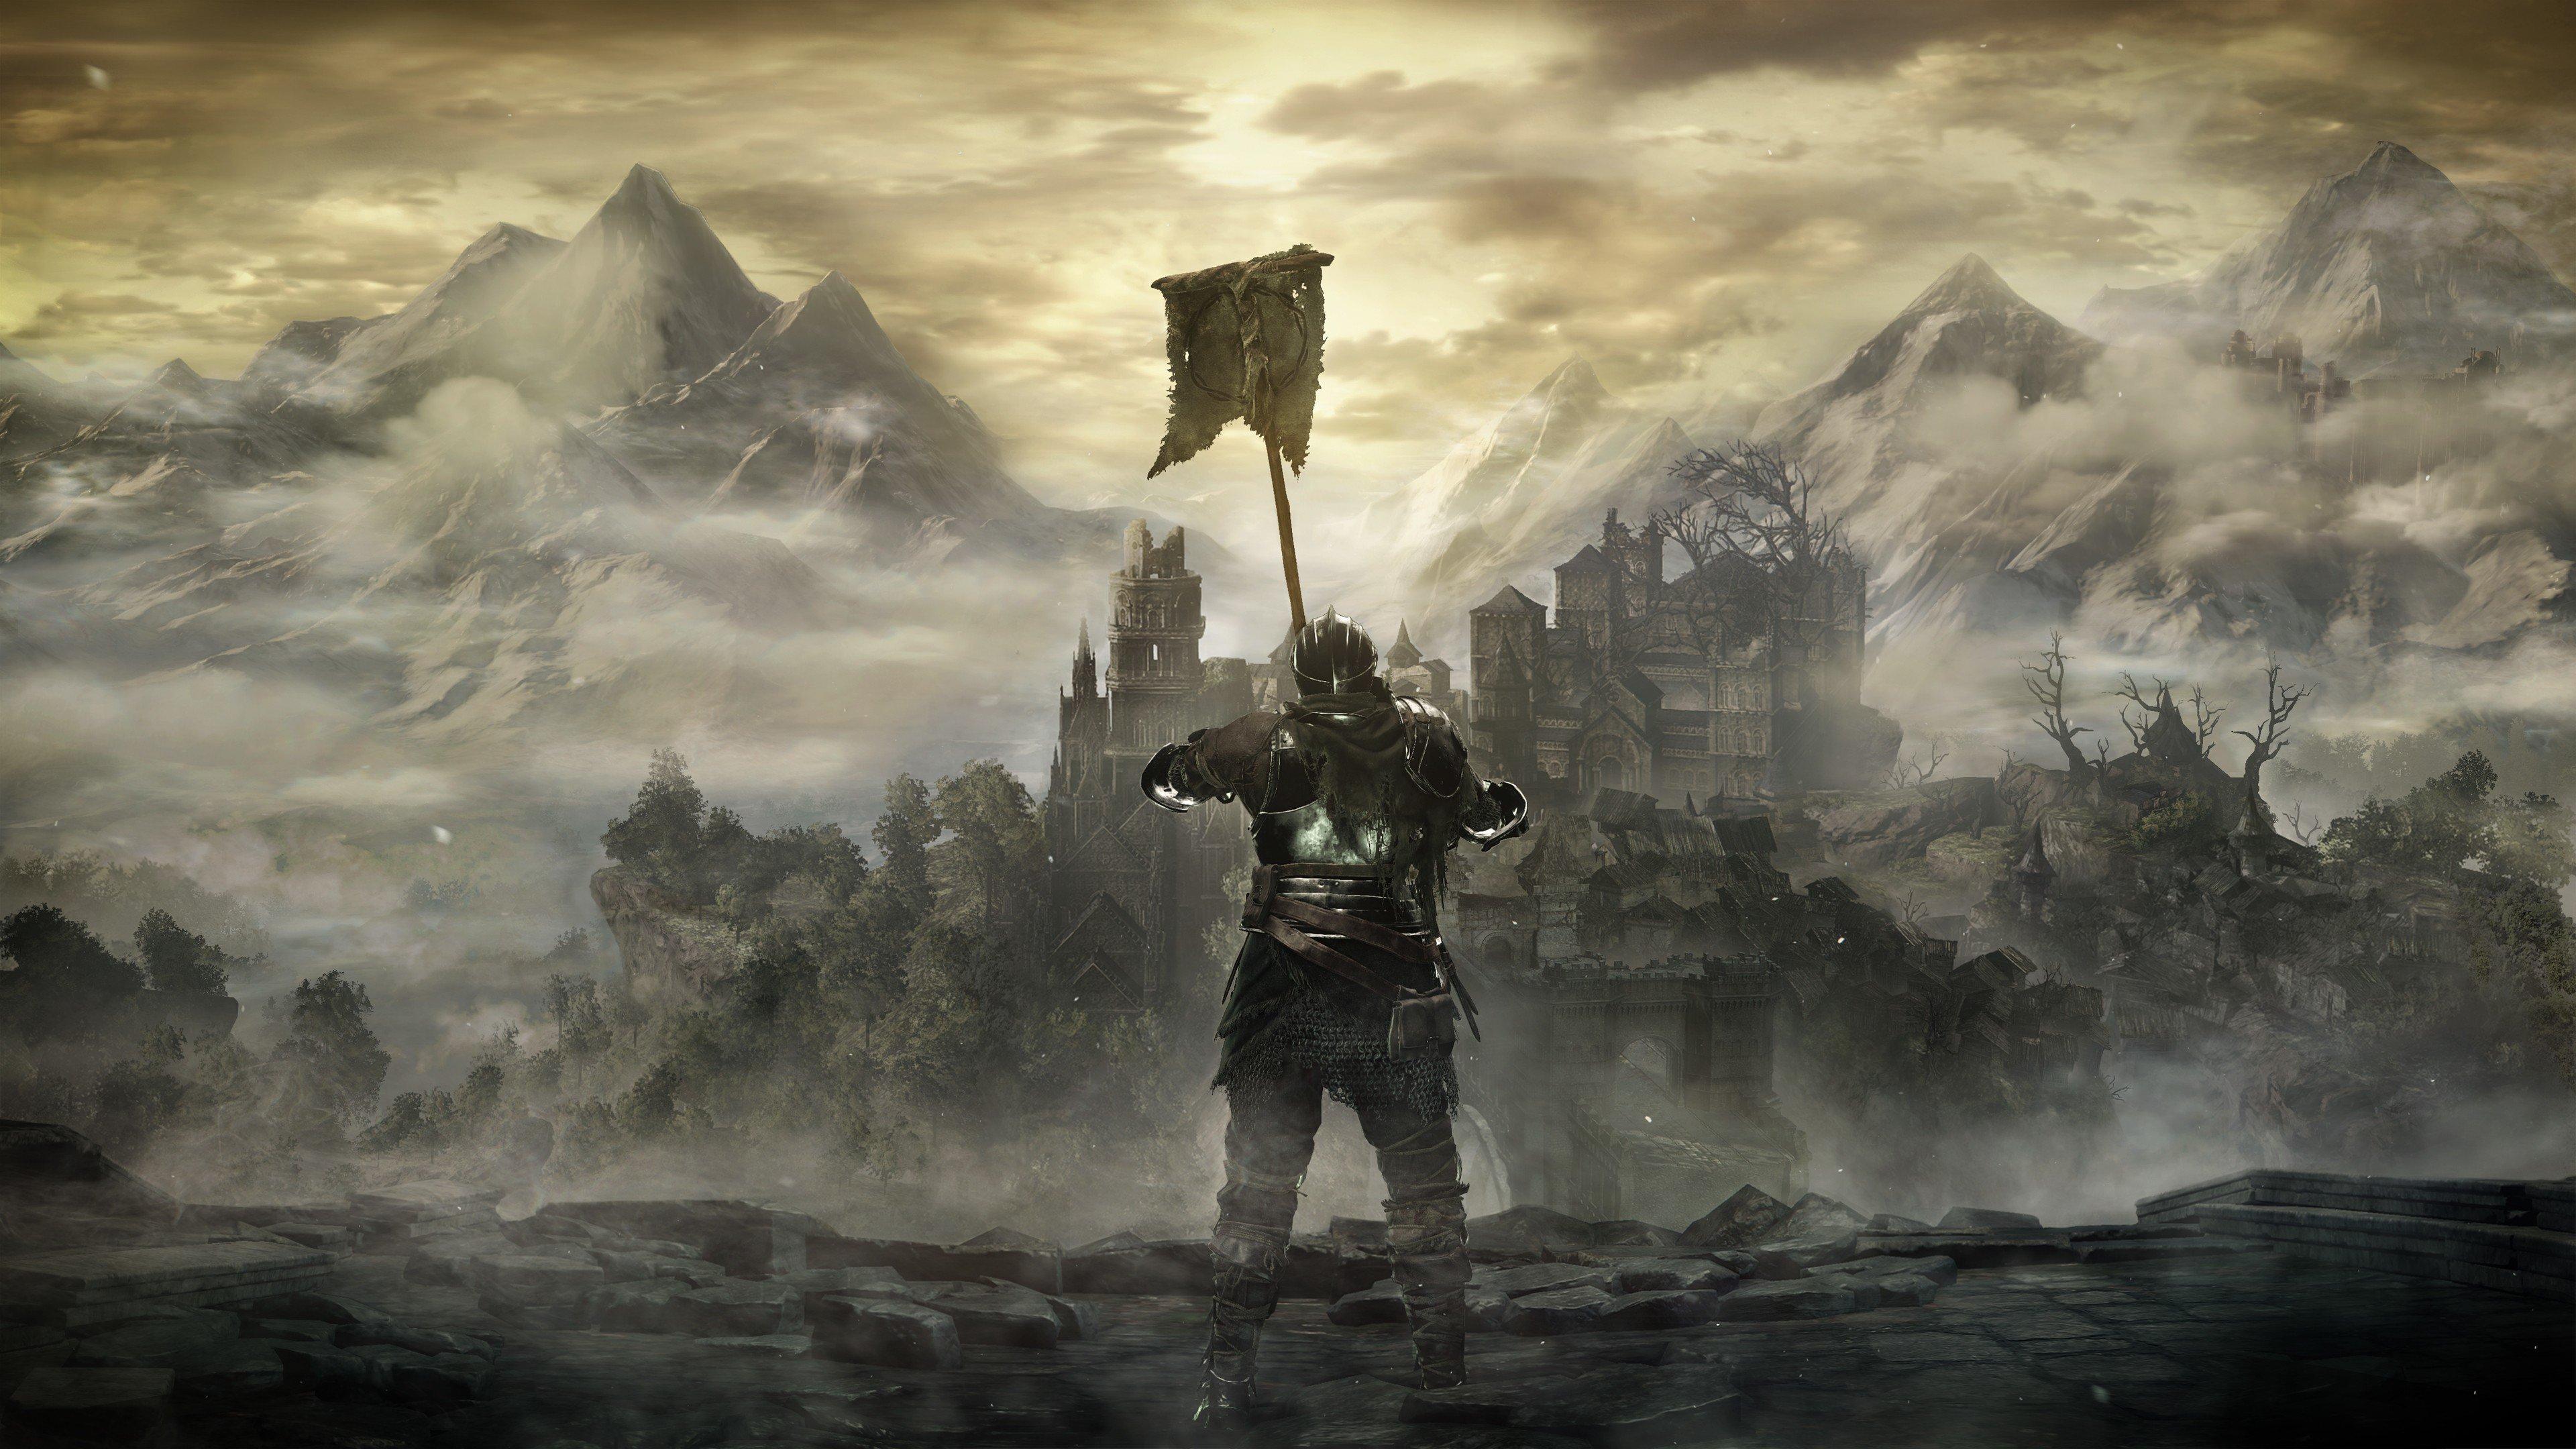 Dark Souls Pc, HD Games, 4k Wallpapers